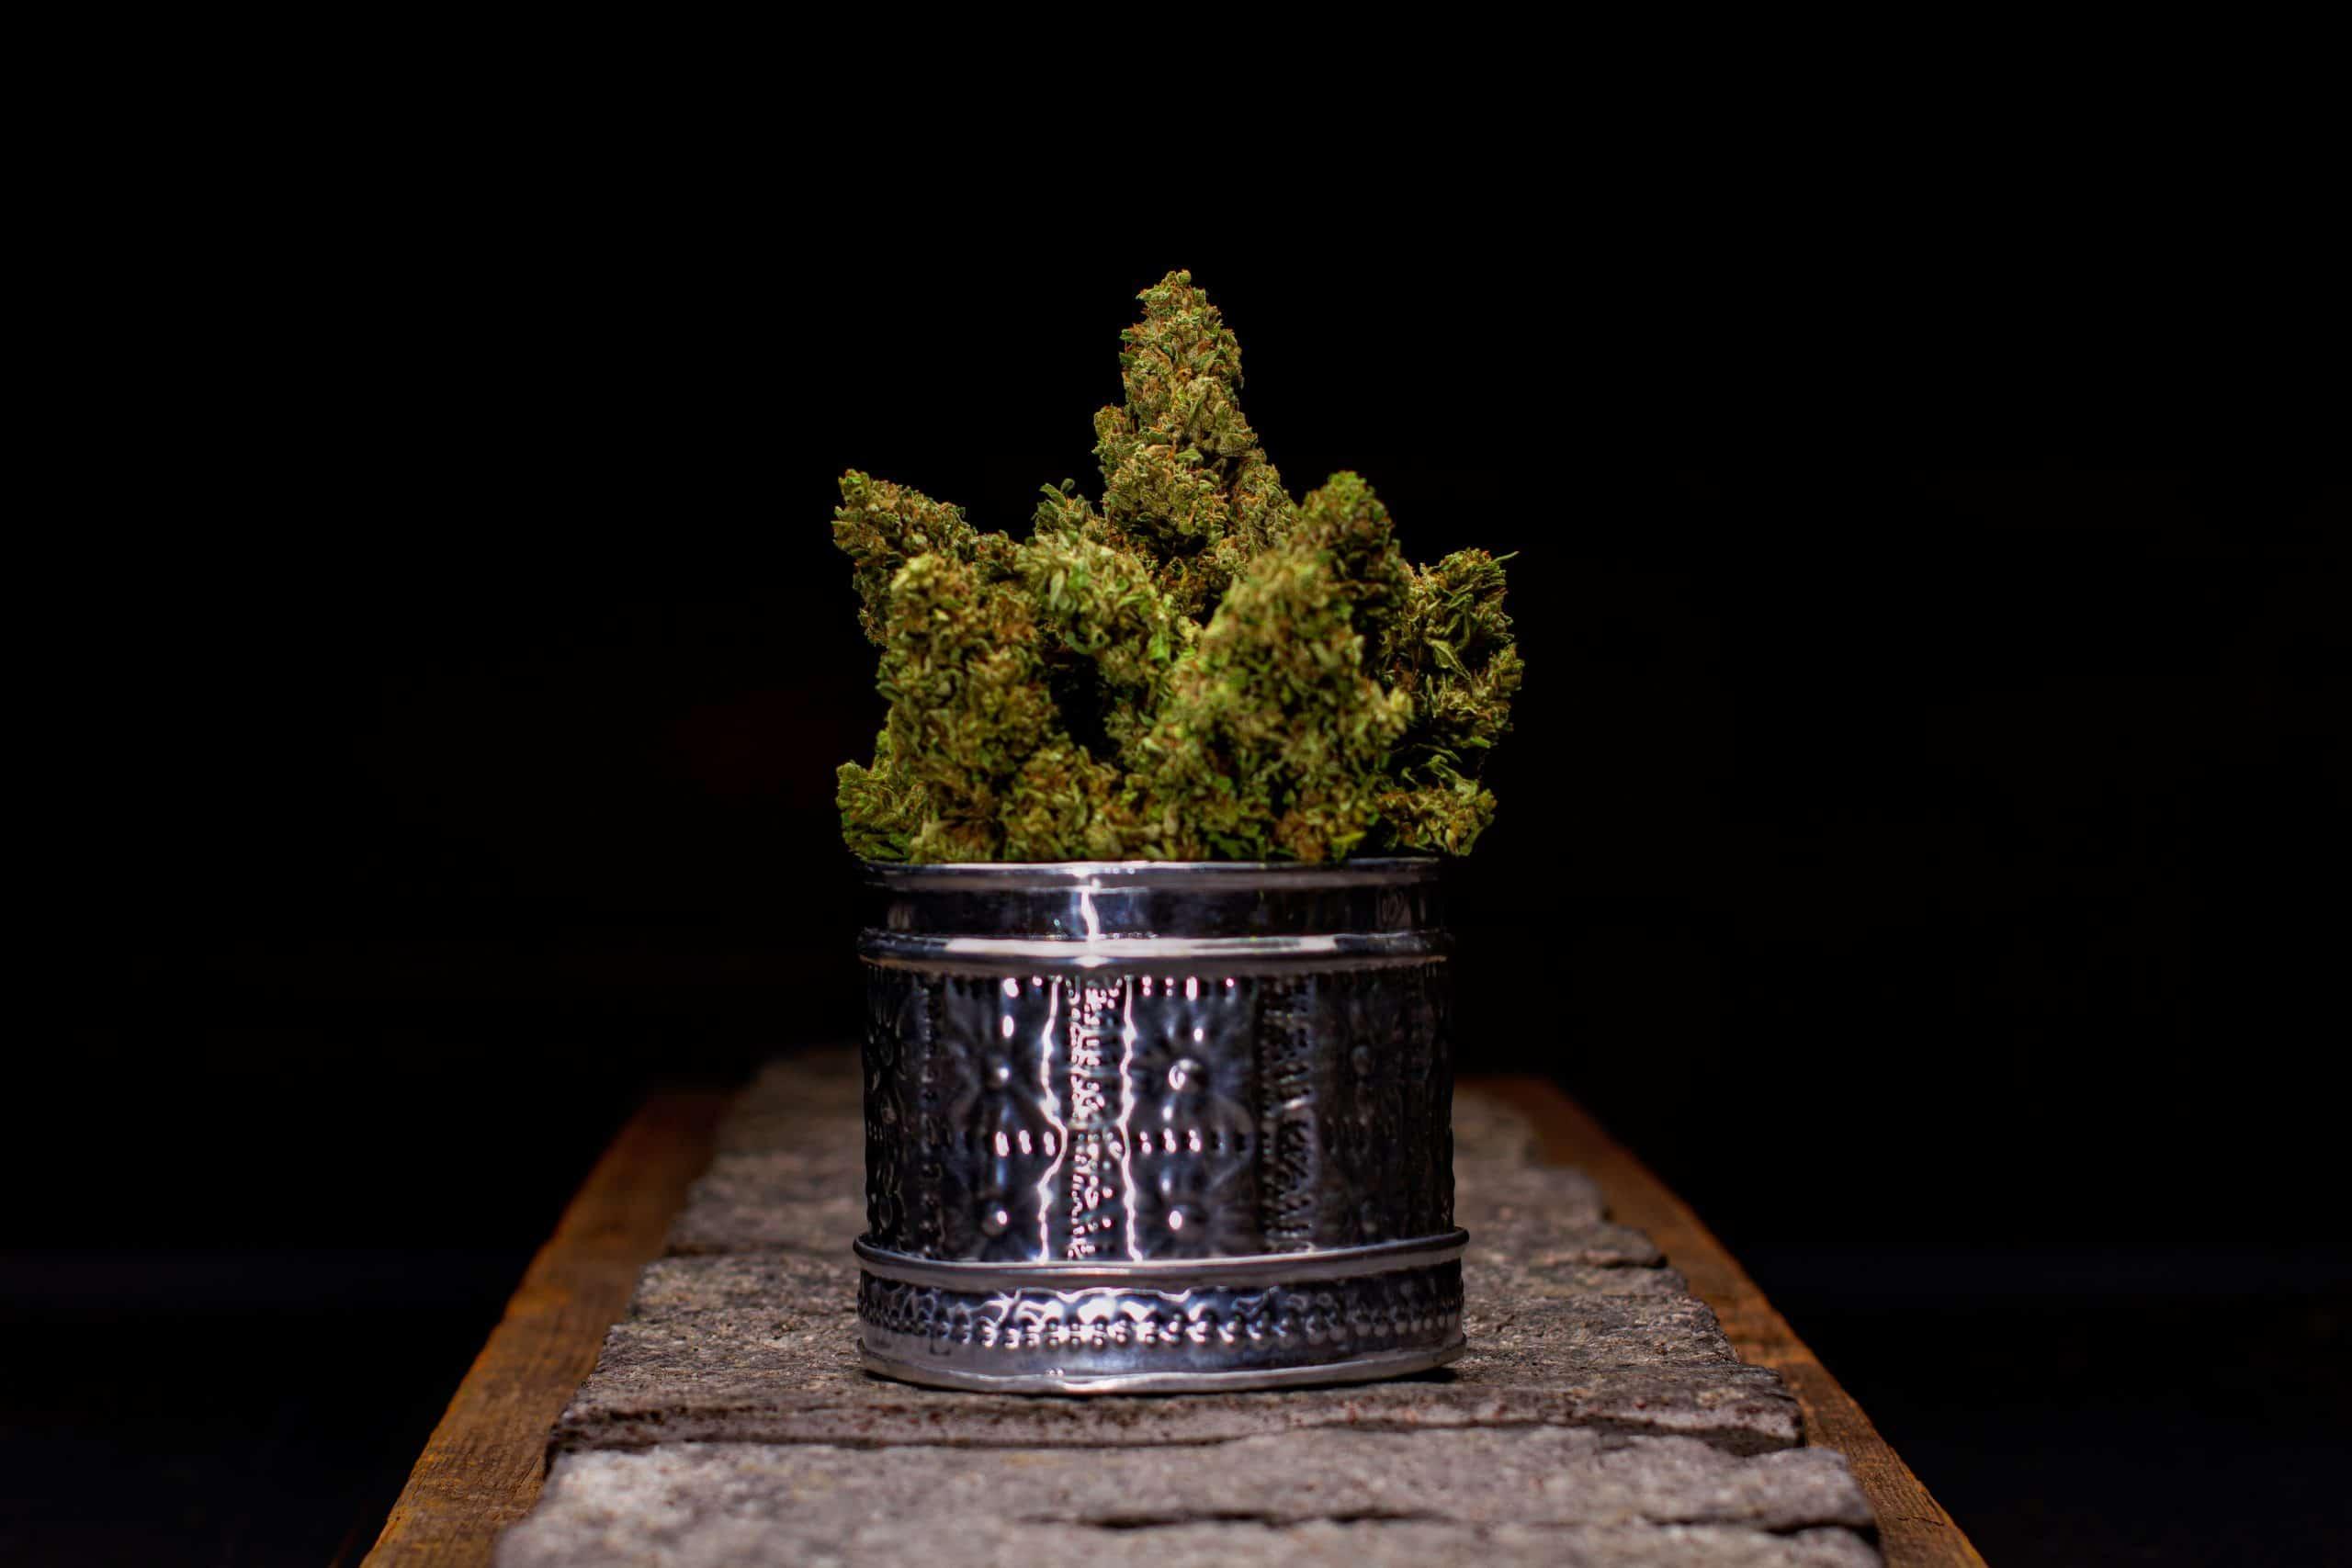 Wiseacre Farm Cannabis Golden Bough Canna Provisions Jon Piasecki